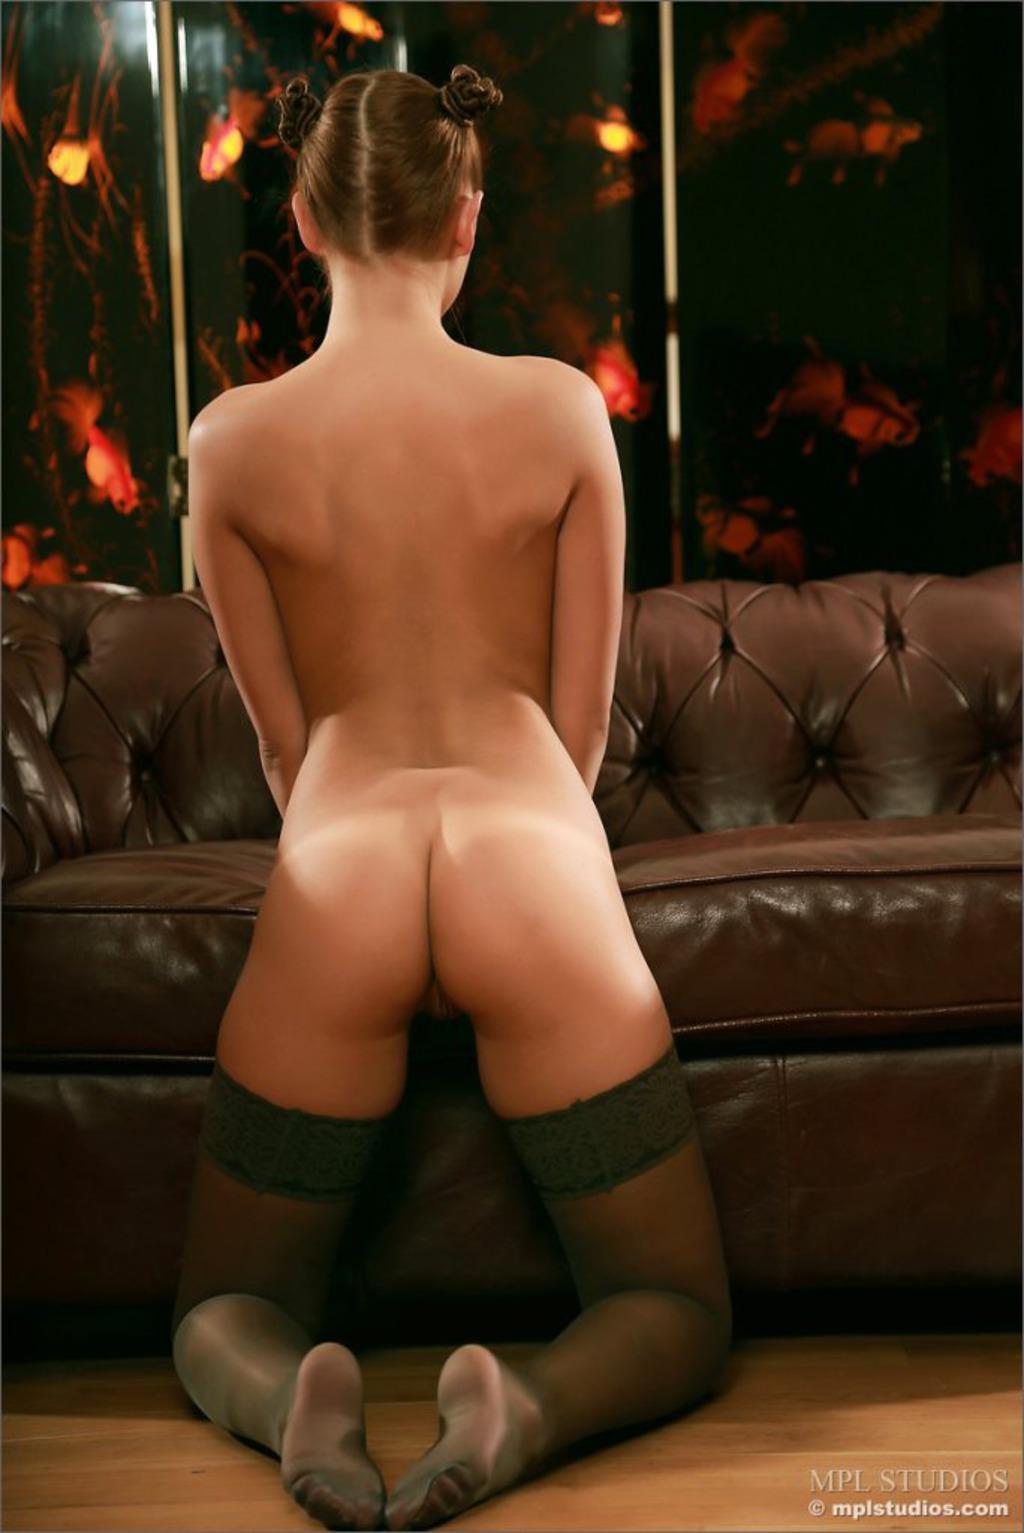 【若尻Only!】 尻画像 part15【和洋OK】 [無断転載禁止]©bbspink.comYouTube動画>1本 ->画像>3327枚